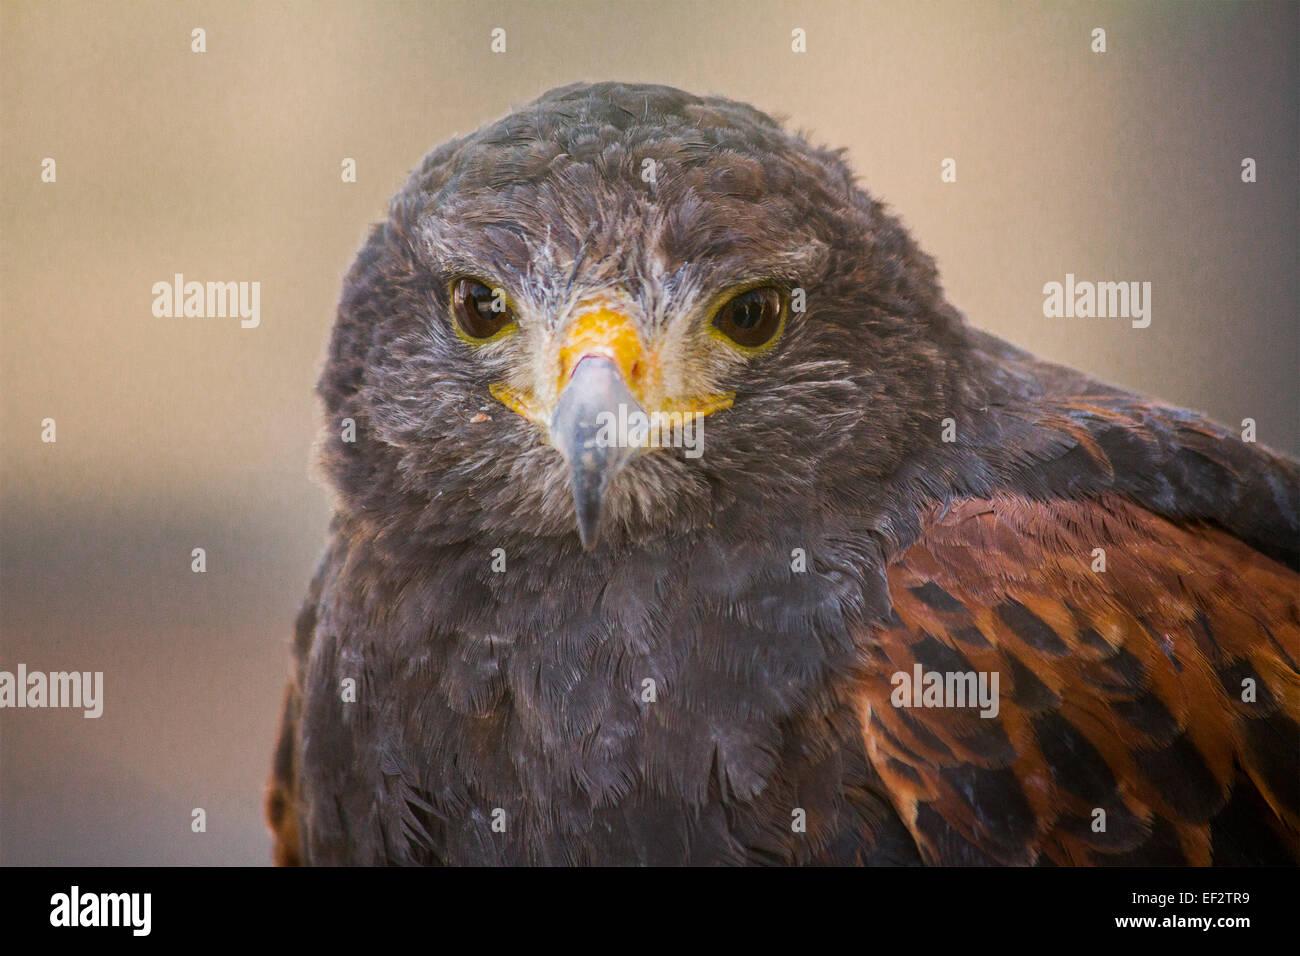 front-facial-view-of-a-harris-hawk-EF2TR9.jpg